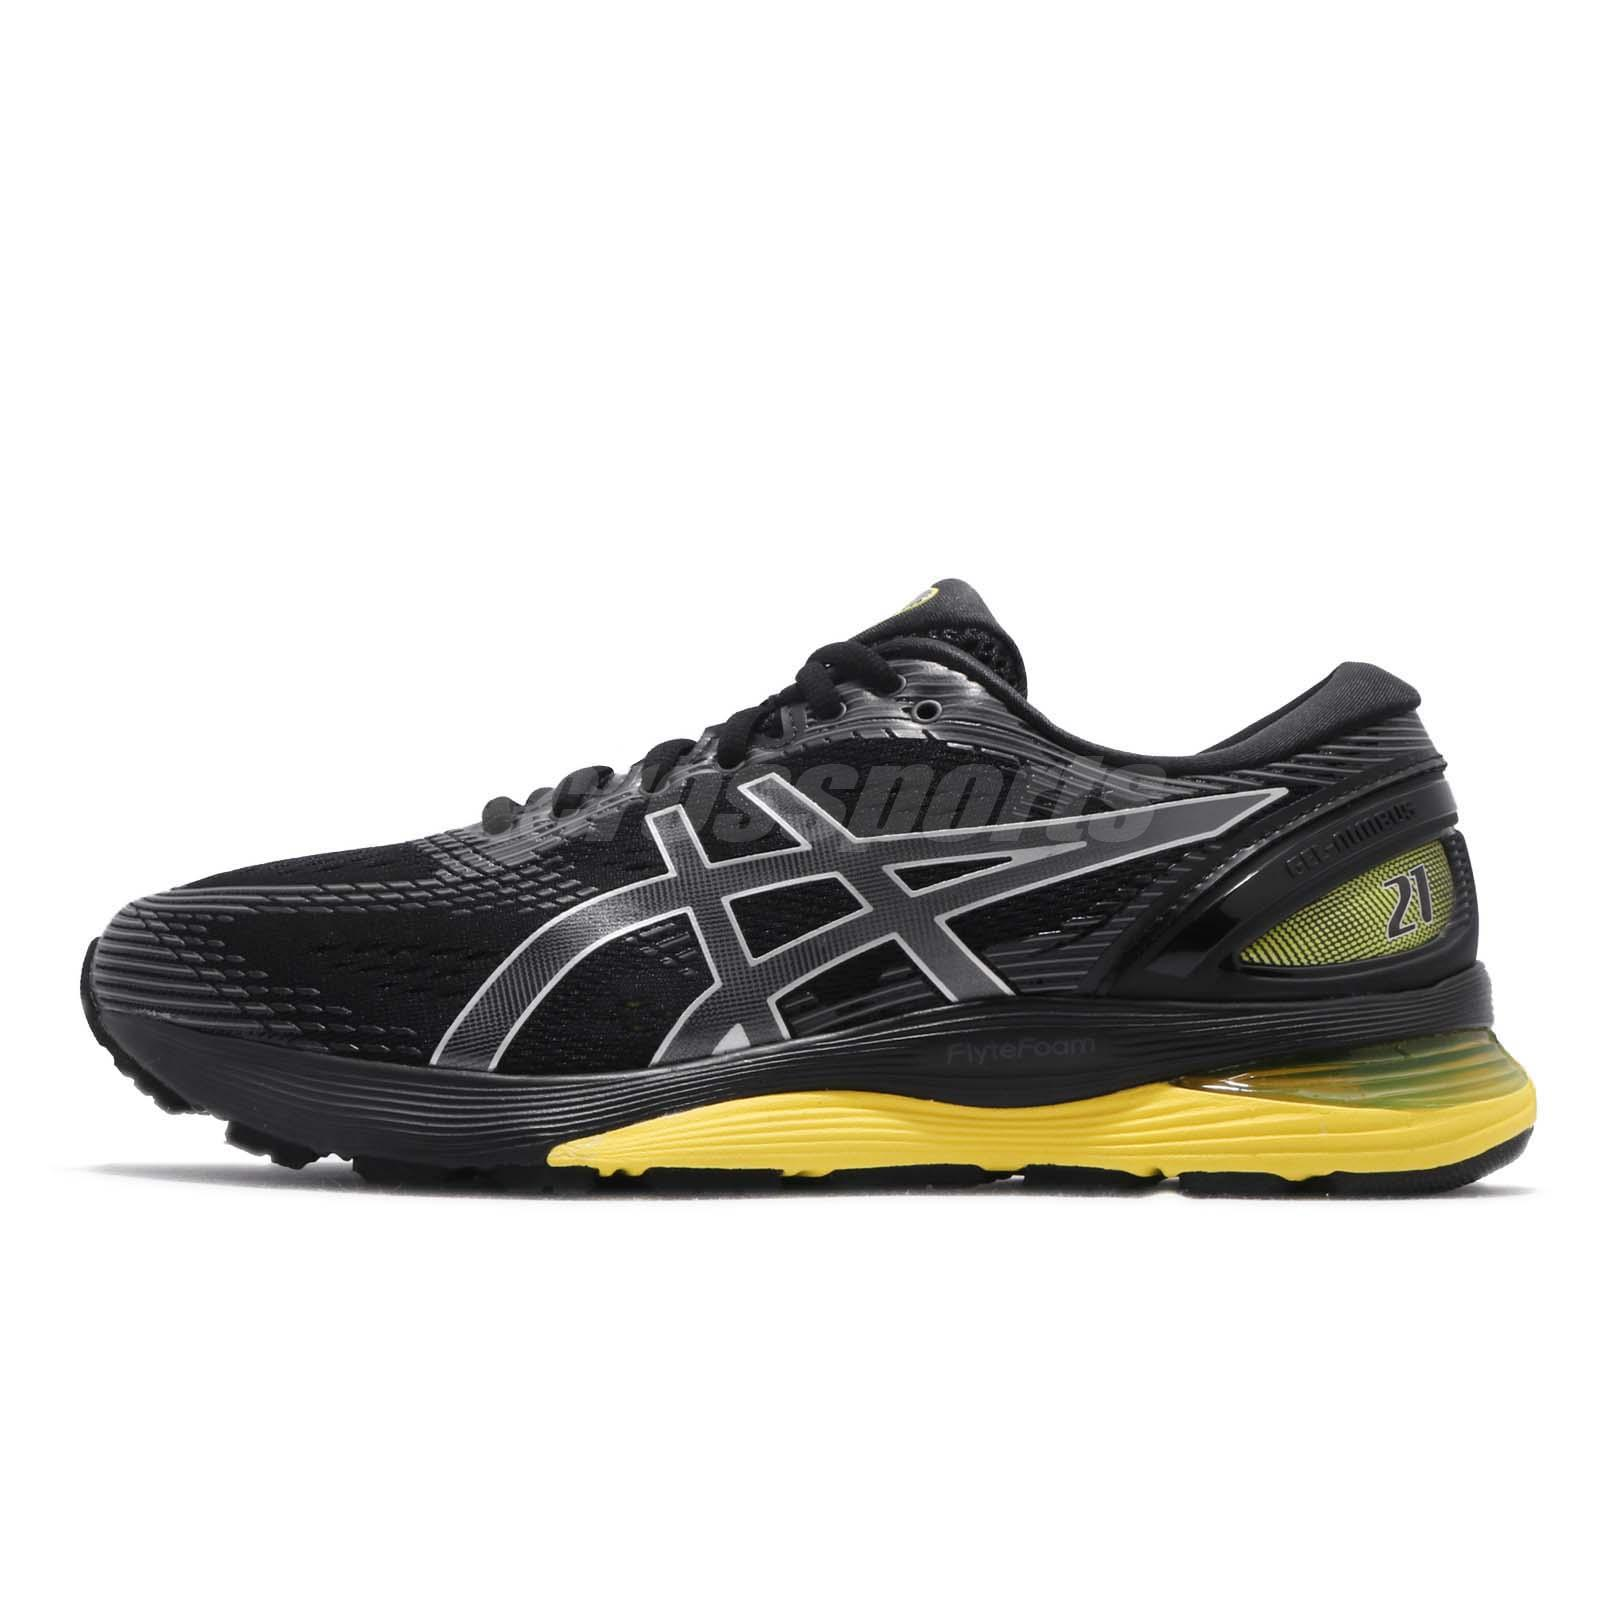 0eb5fd221a8a Asics Gel Nimbus 21 2E Wide Black Lemon Spark Men Running Shoes 1011A172-003